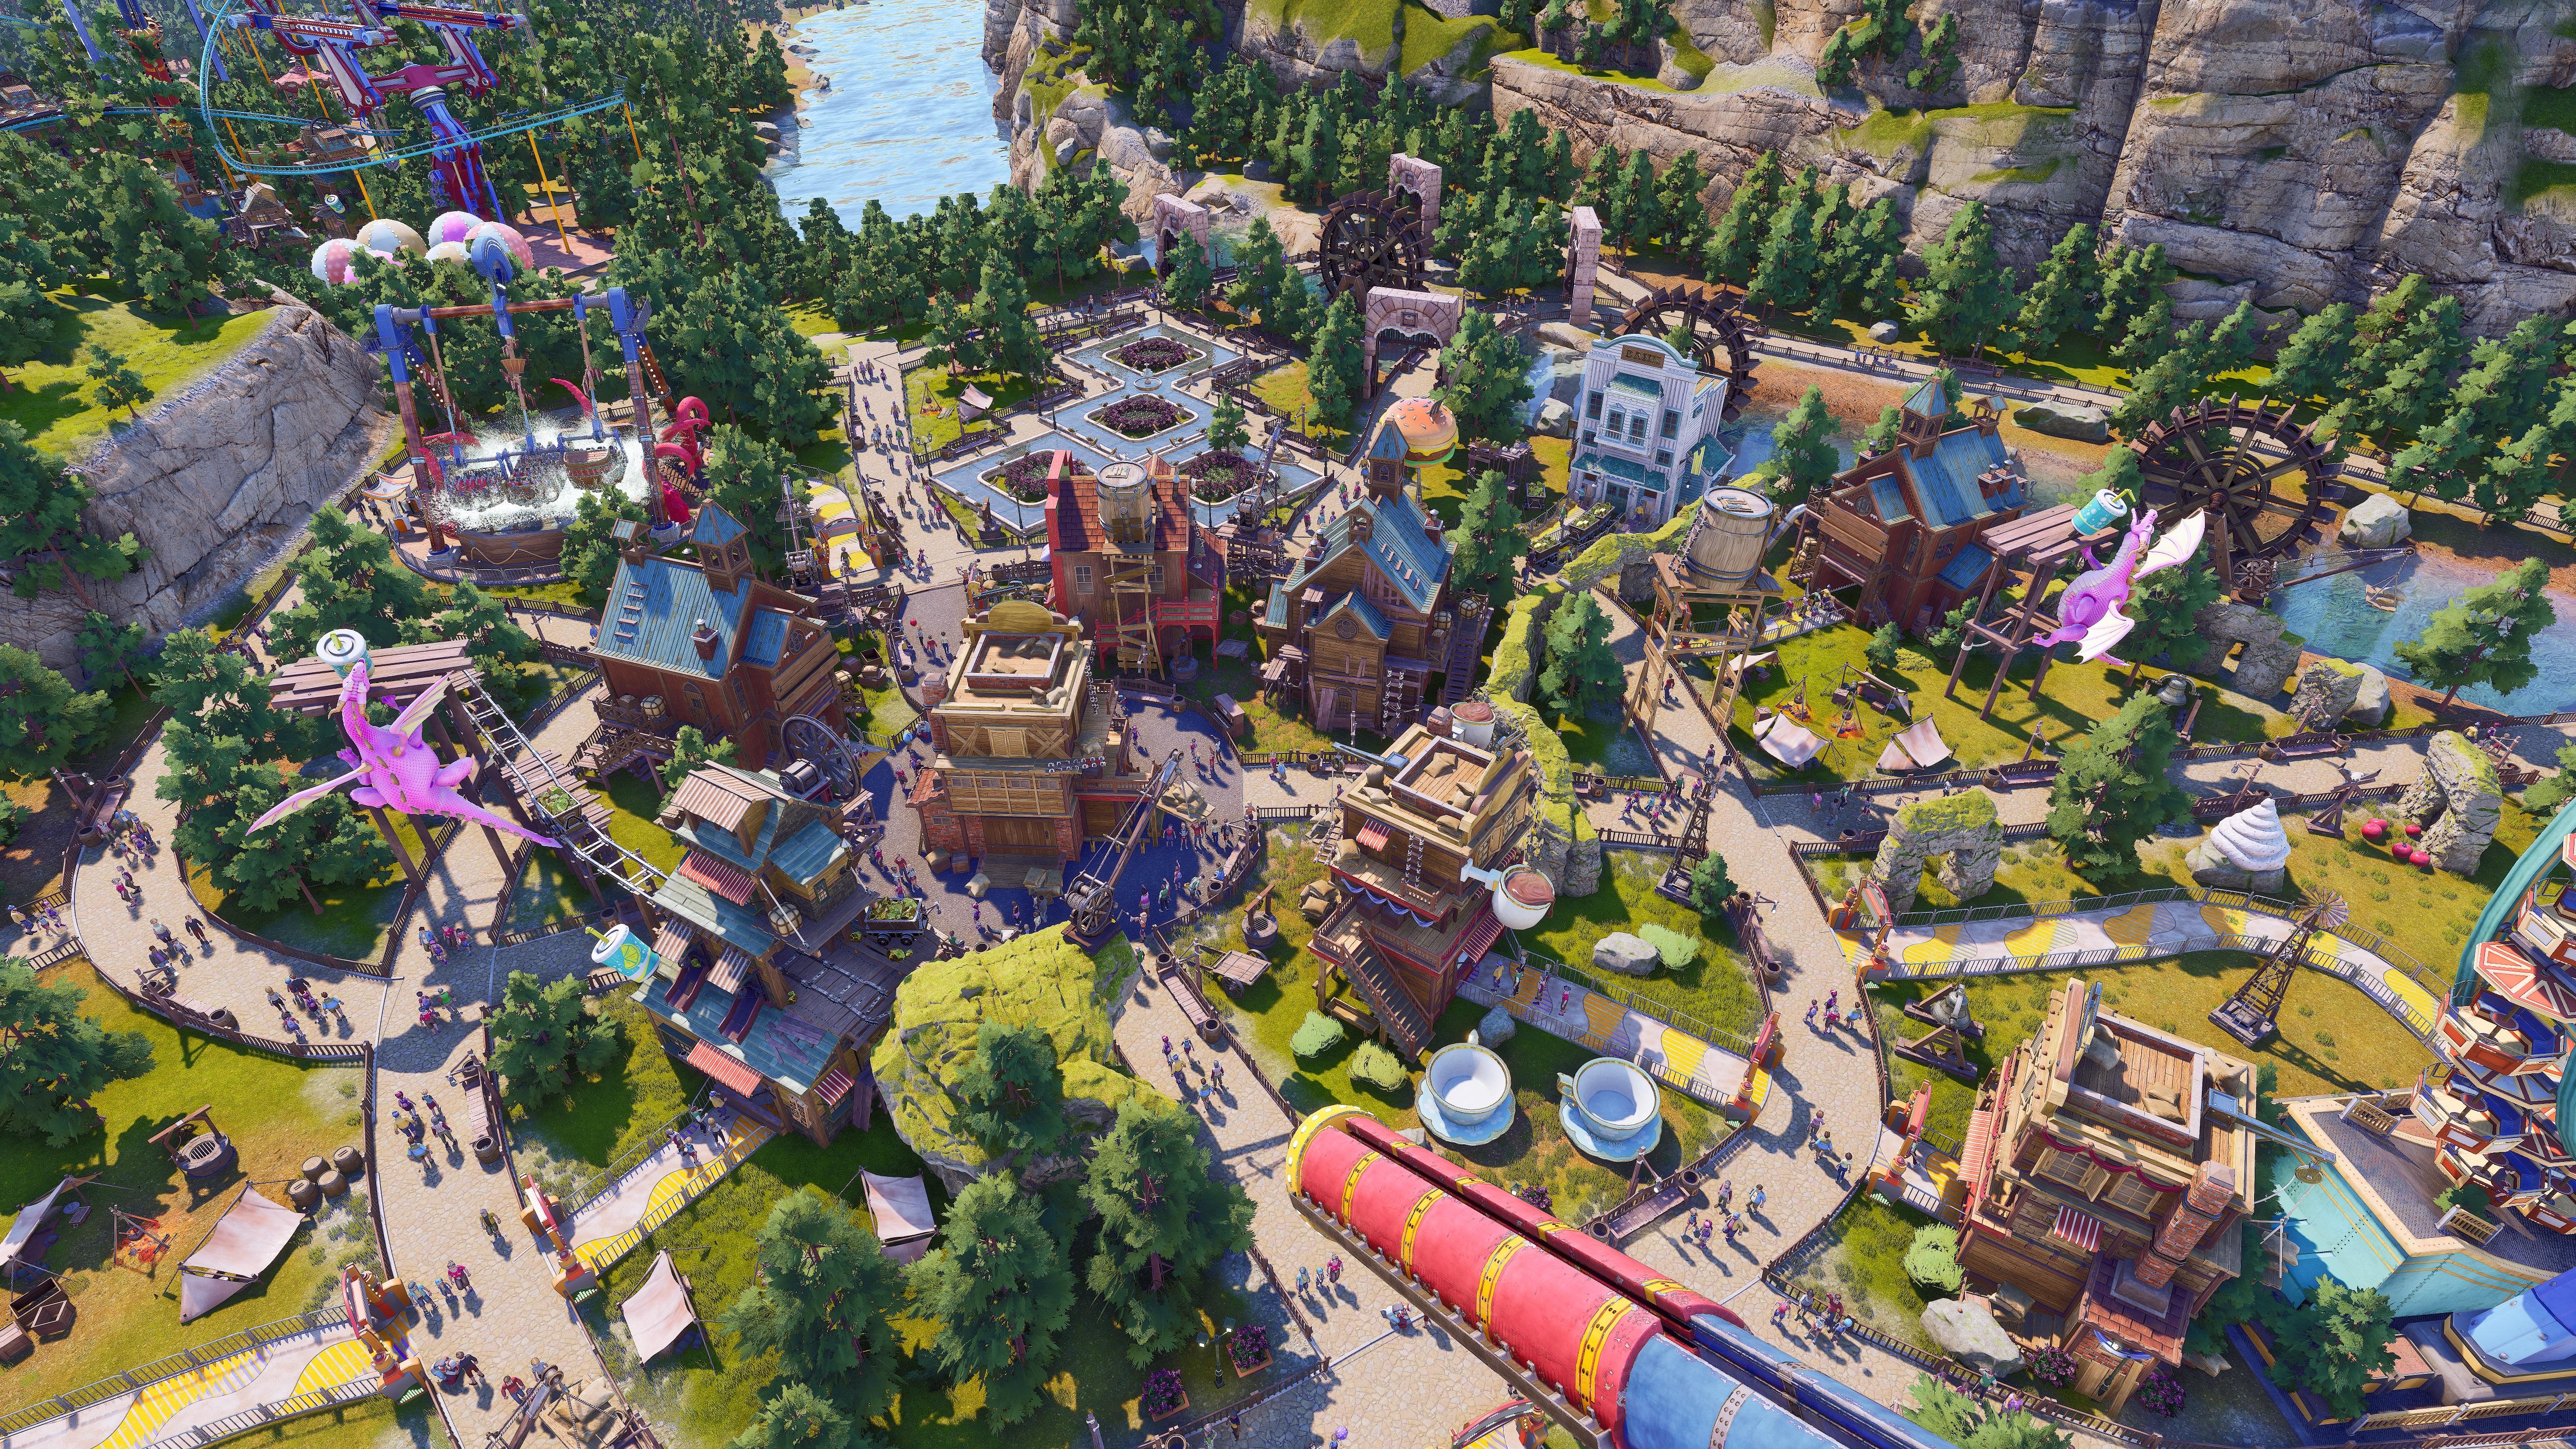 A Wild West-themed park